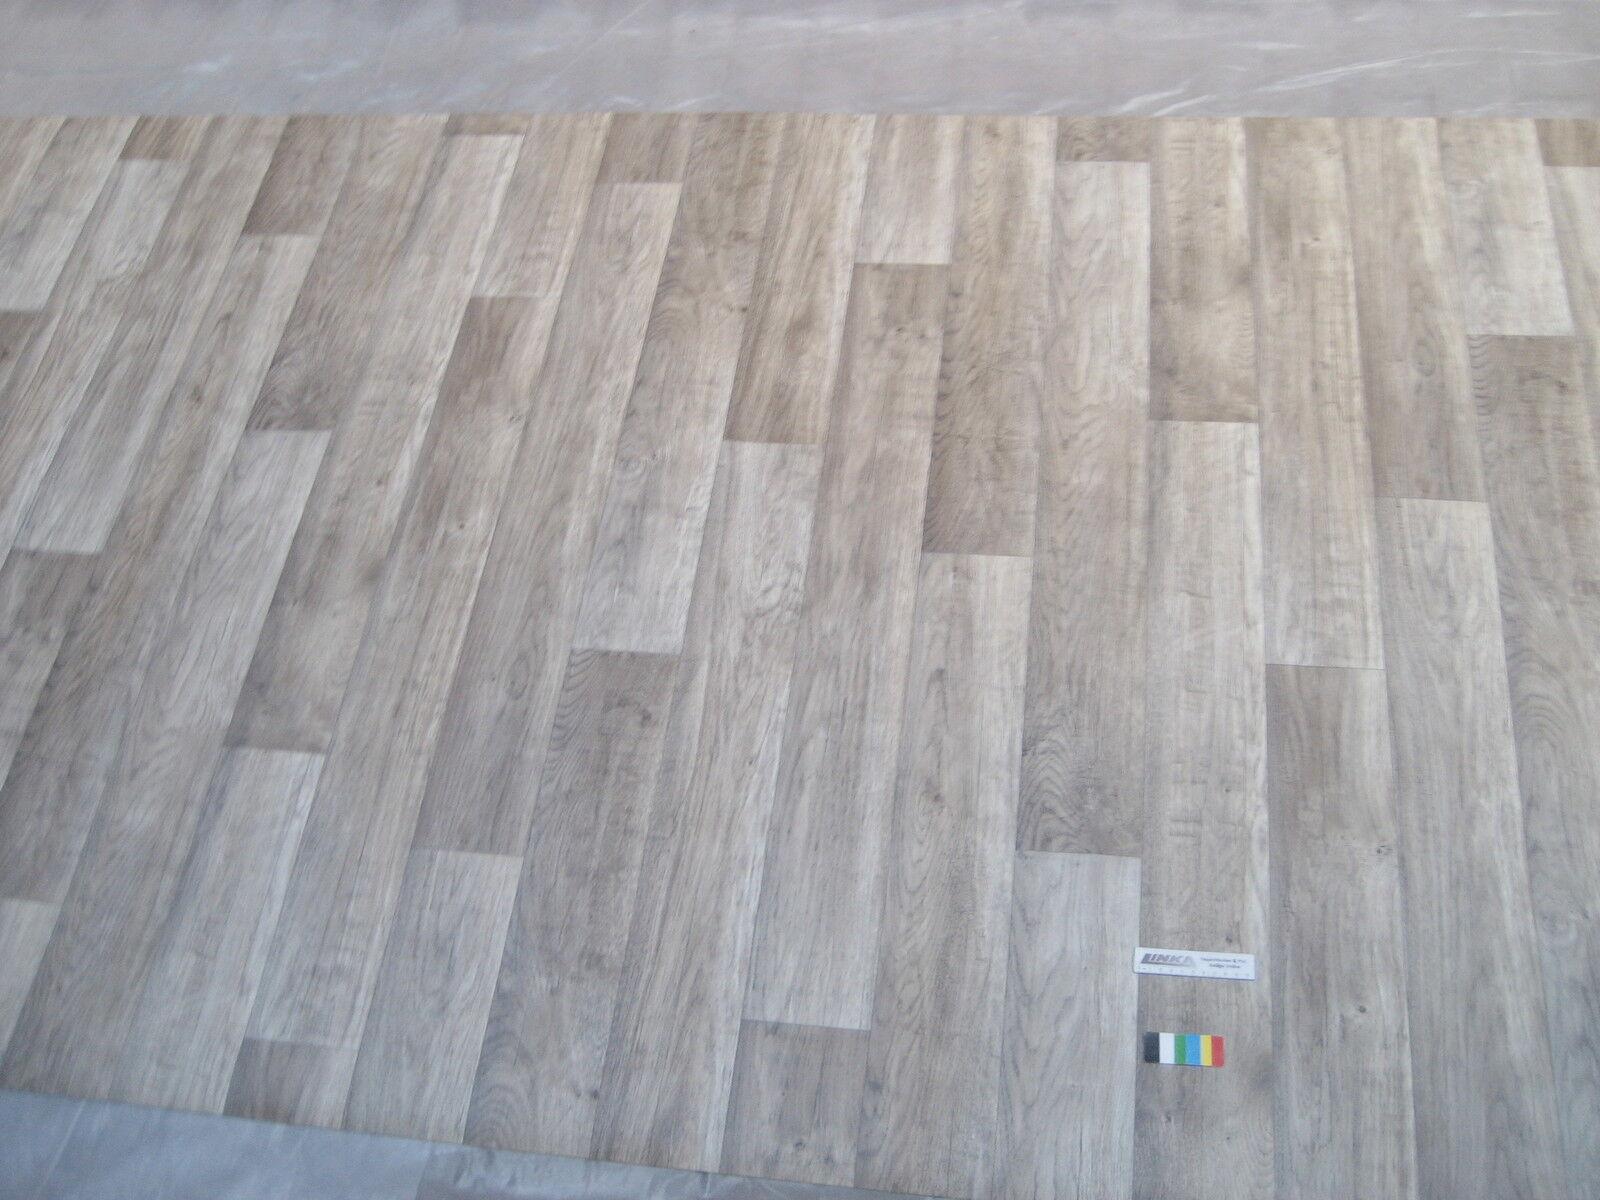 7392 PVC Belag 166x500 Boden Bodenbelag Rest Cv Eiche Landhaus Design Holz Dekor